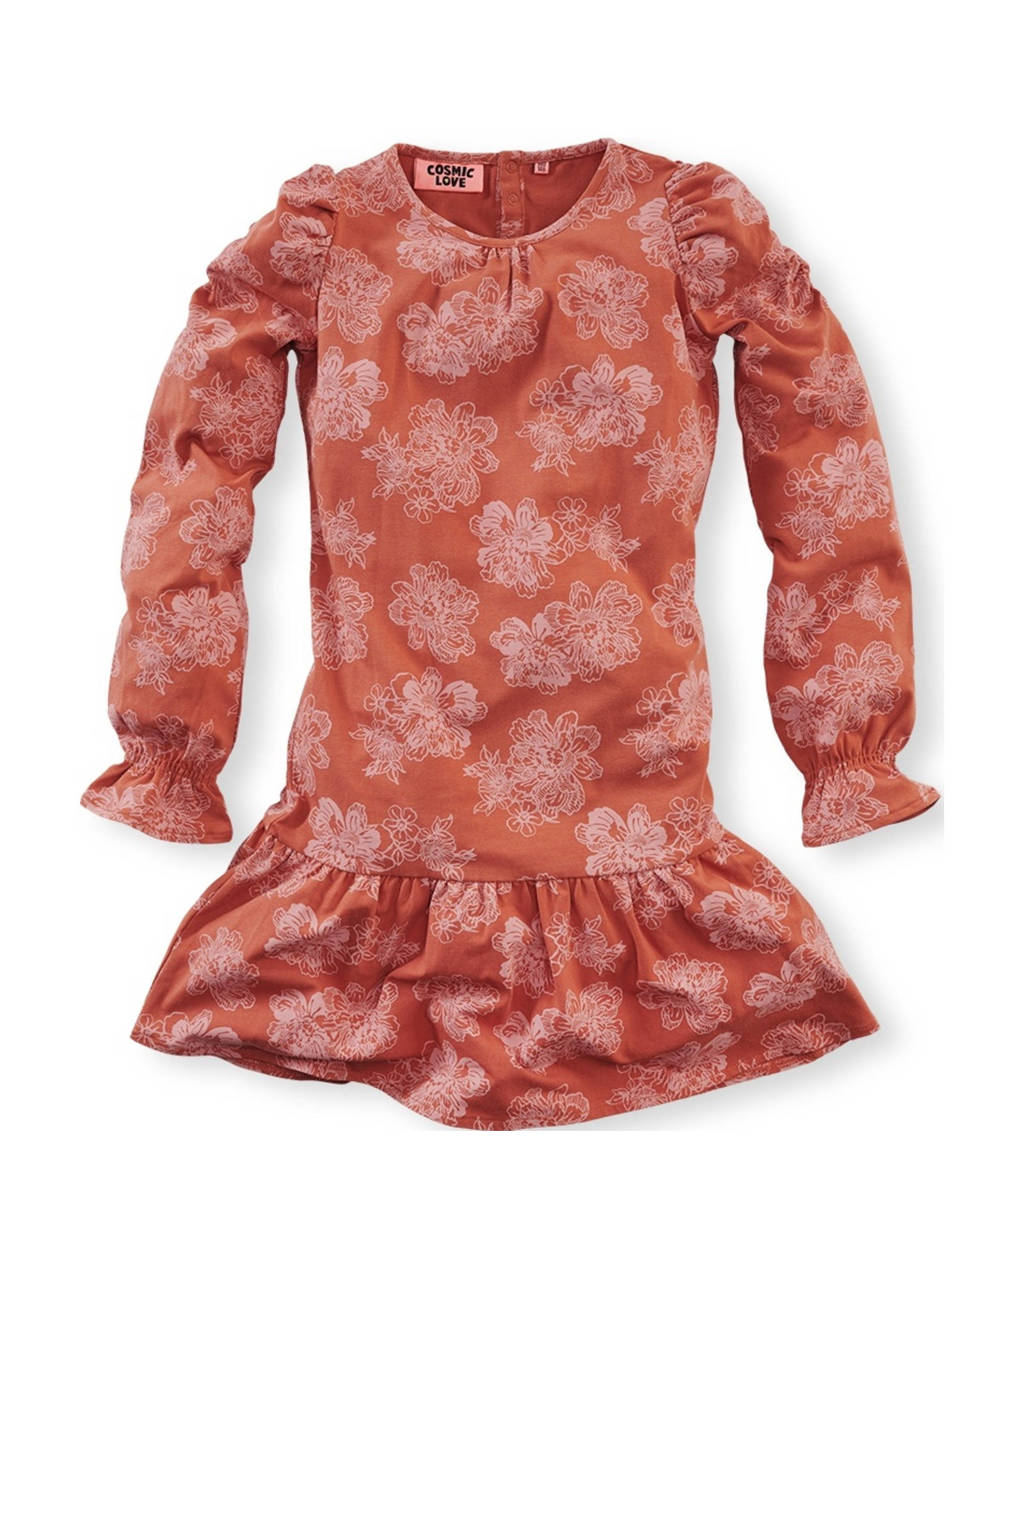 Z8 jersey jurk Janneke met all over print donker oranje/lichtroze, Donker oranje/lichtroze